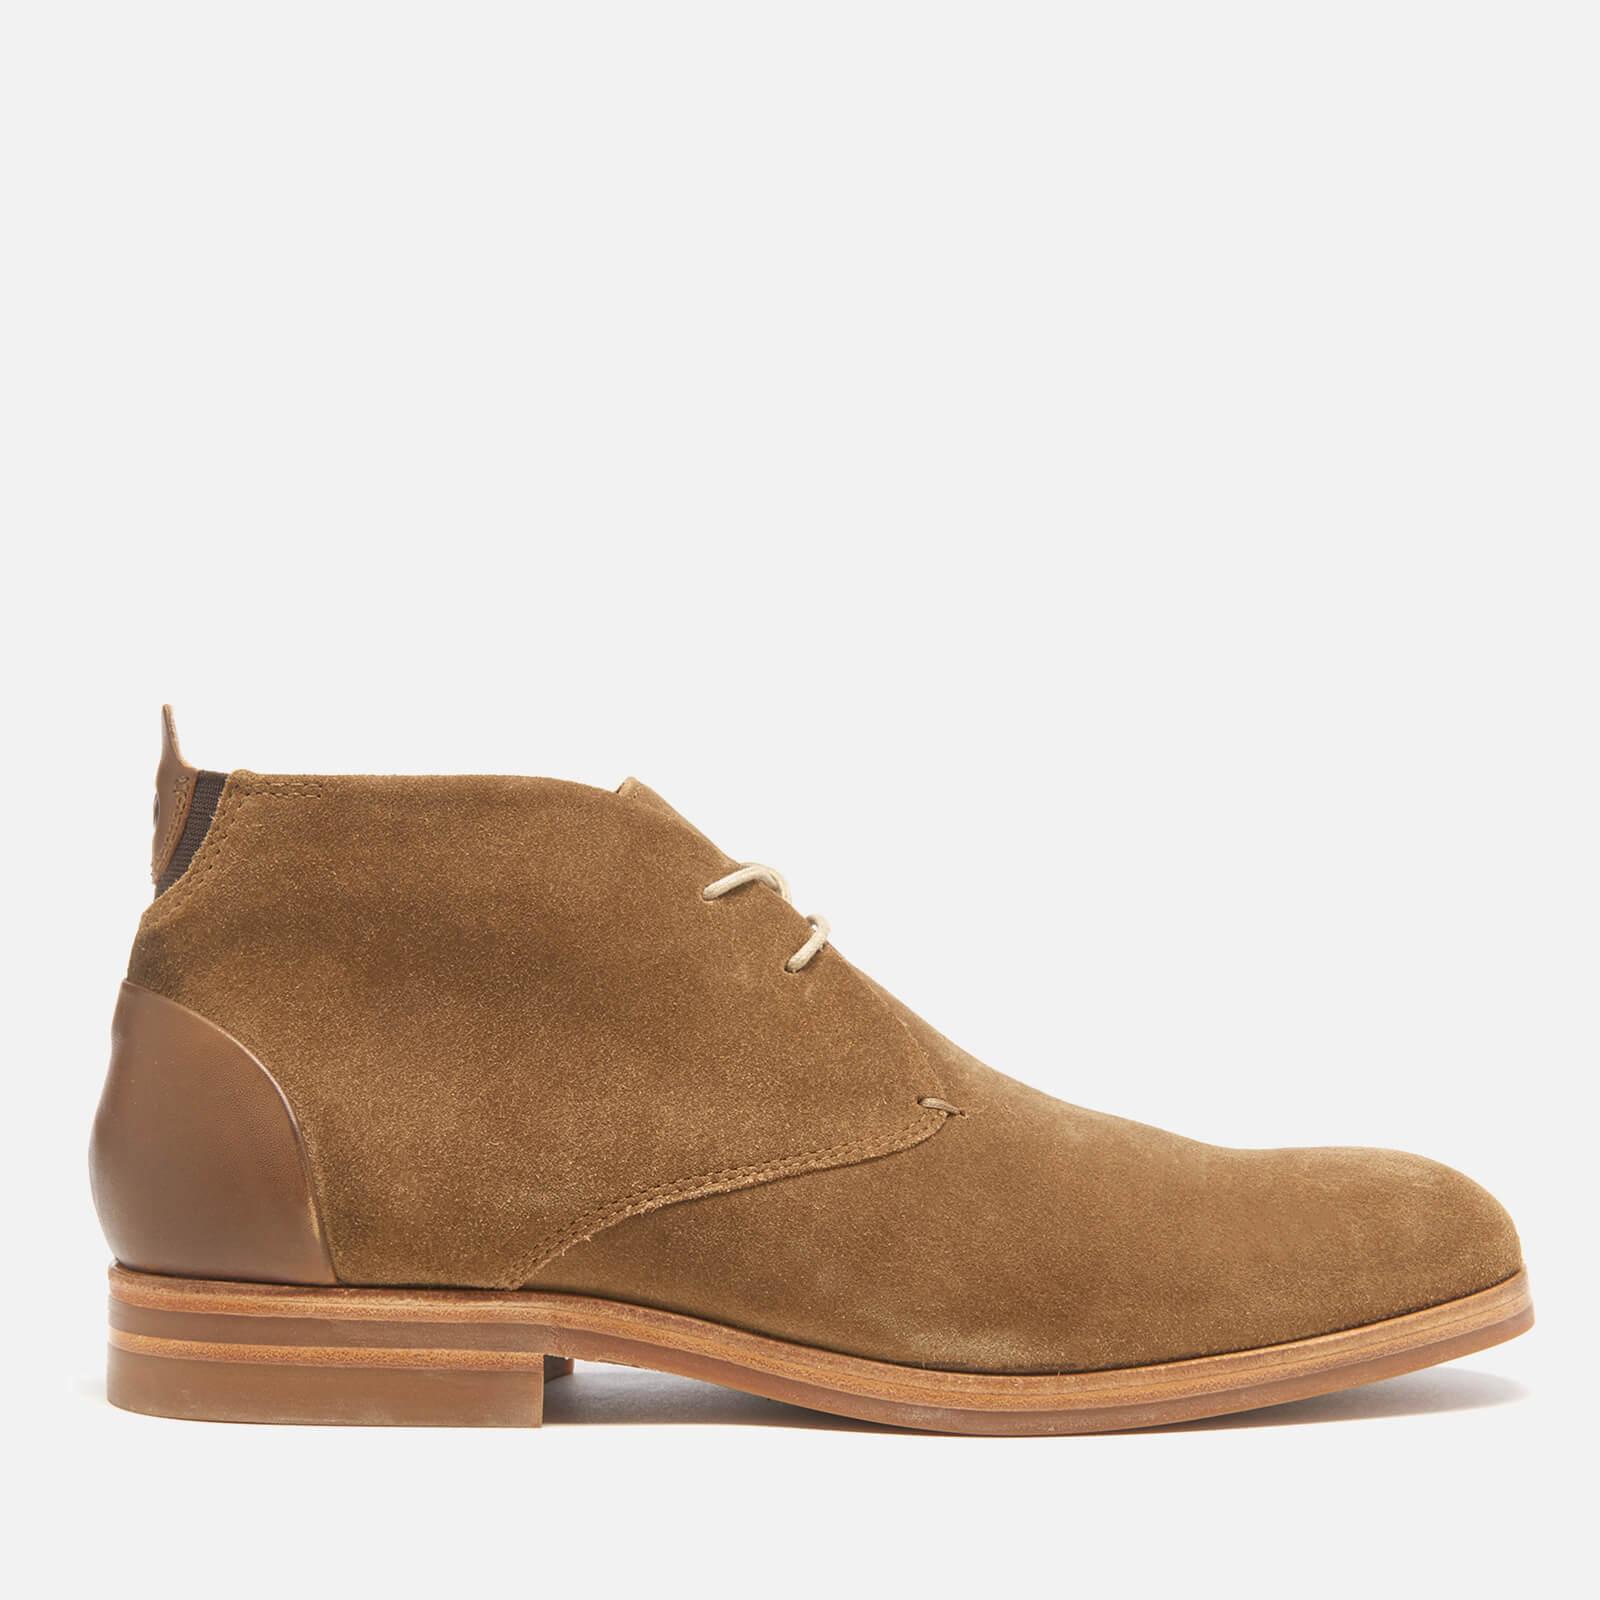 Allsole: 30% Off Hudson London Men's Matteo Suede Chukka Boots